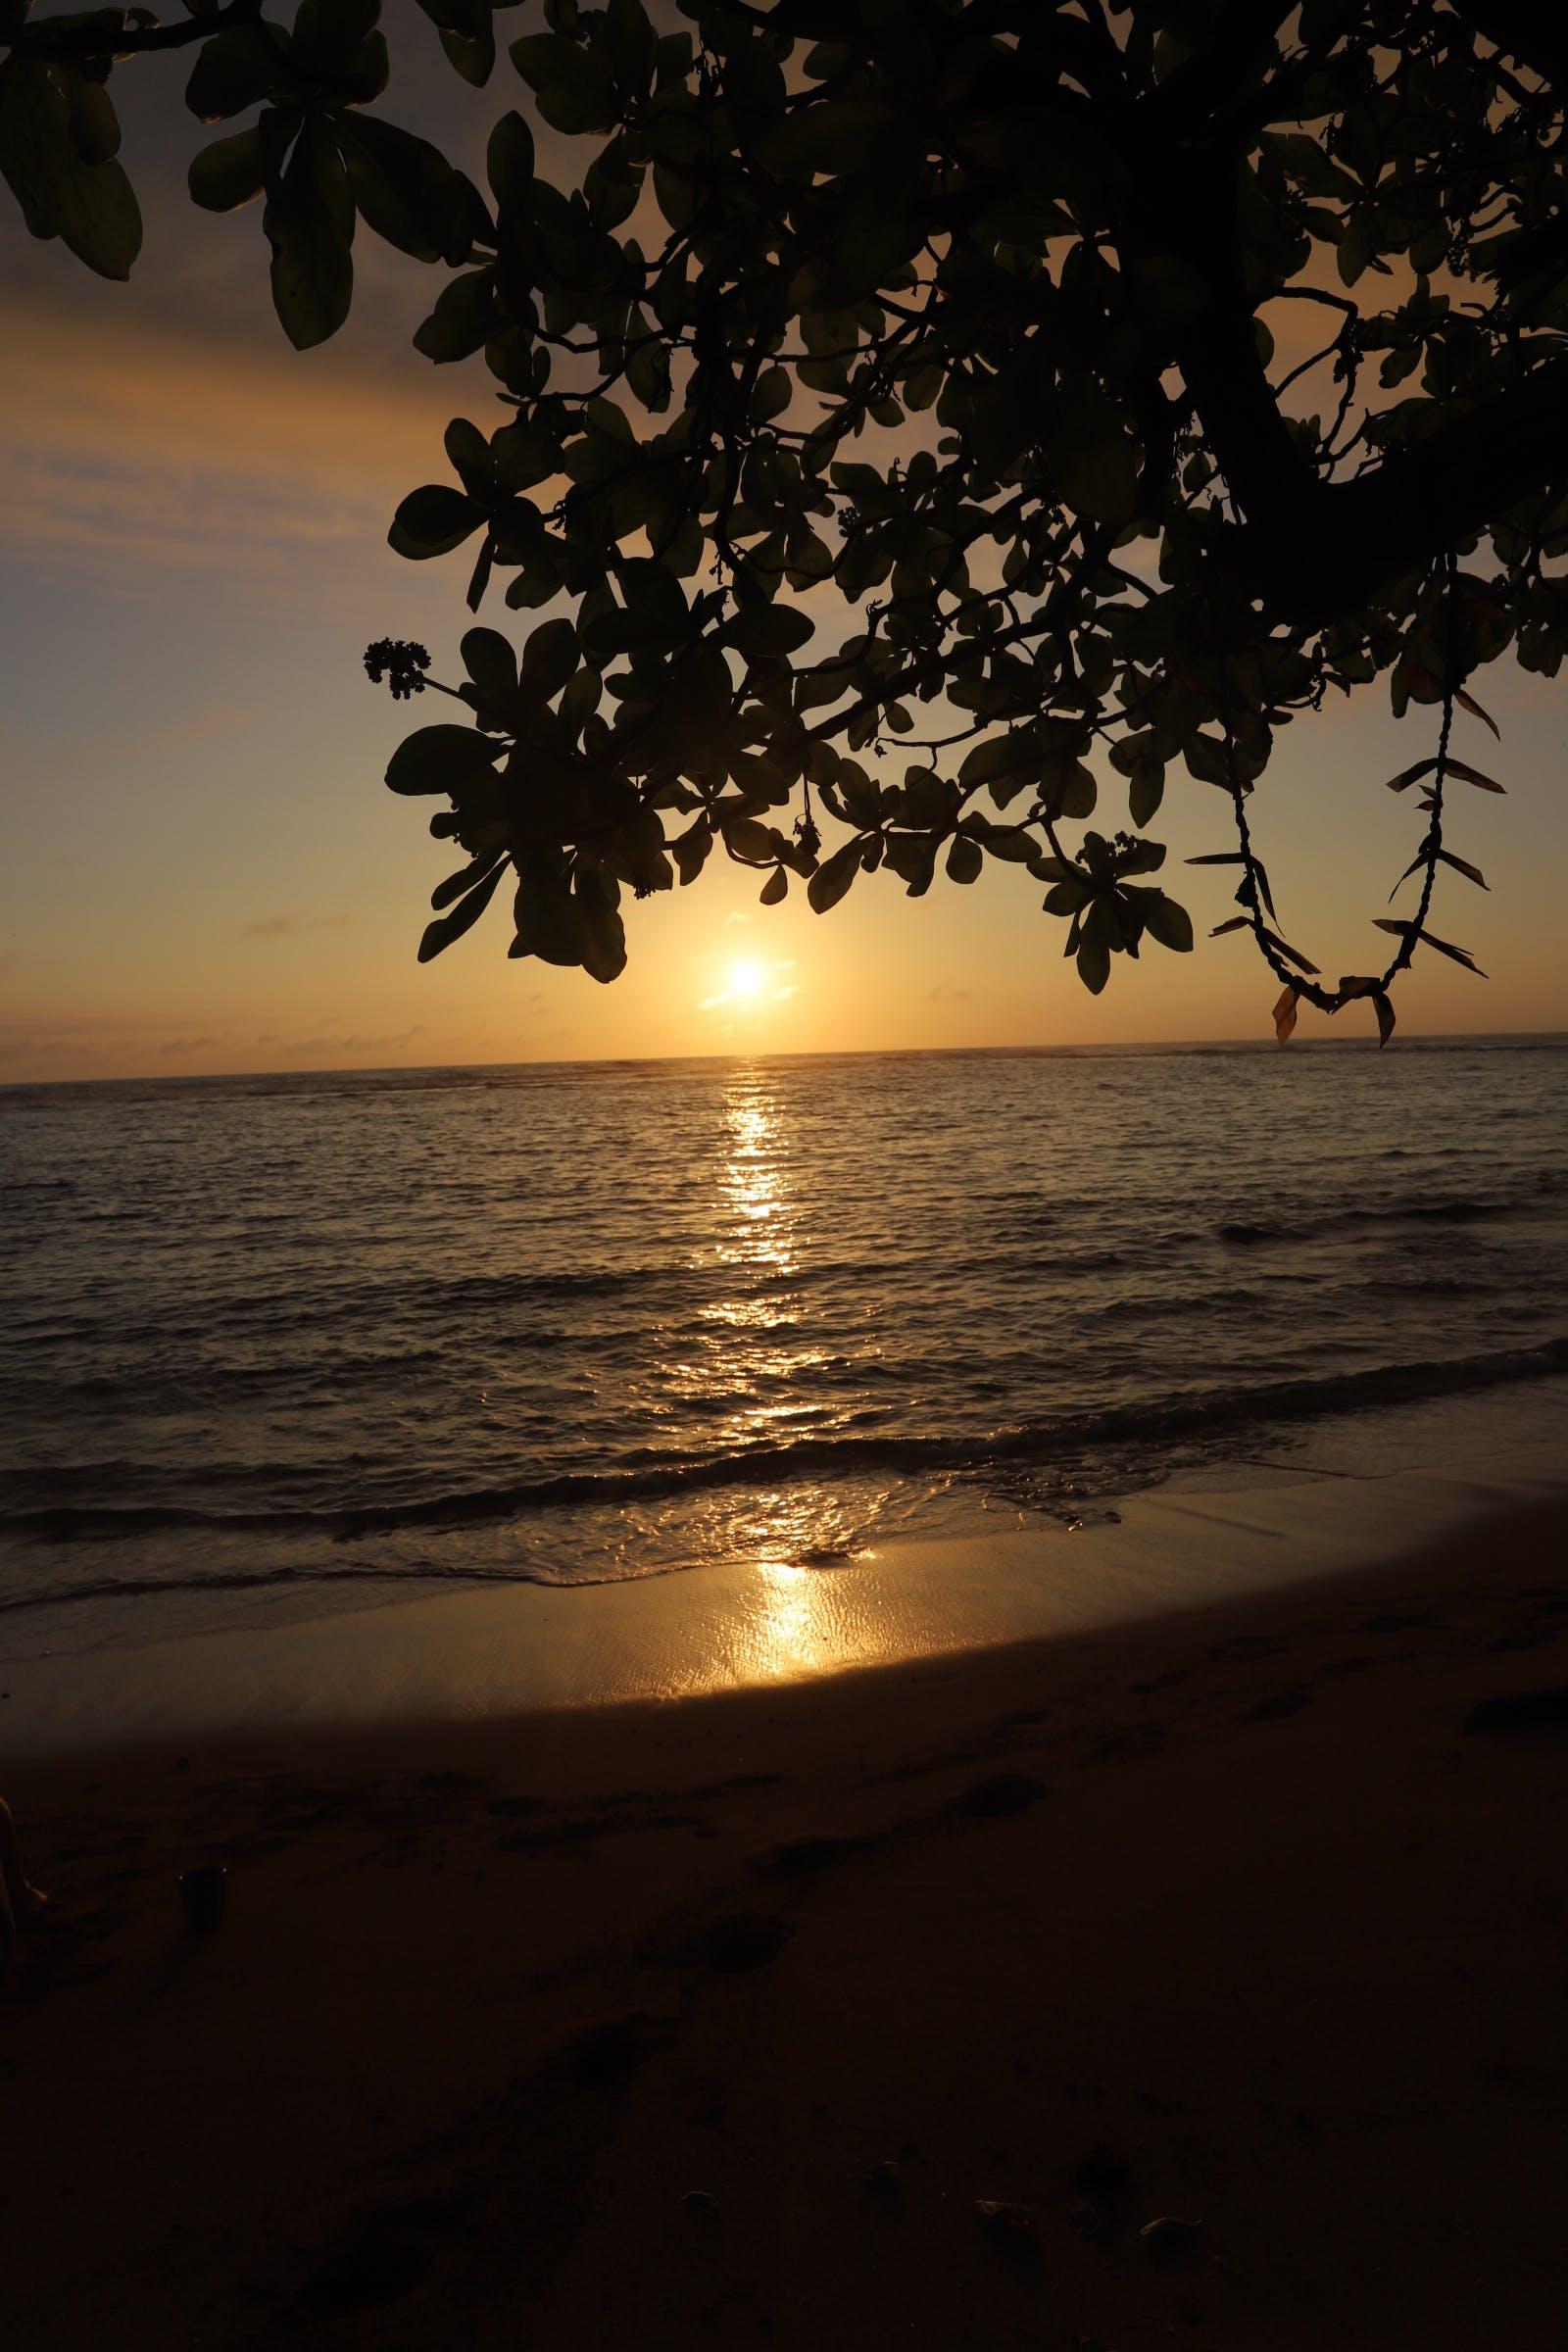 Gratis lagerfoto af kauai, solnedgang